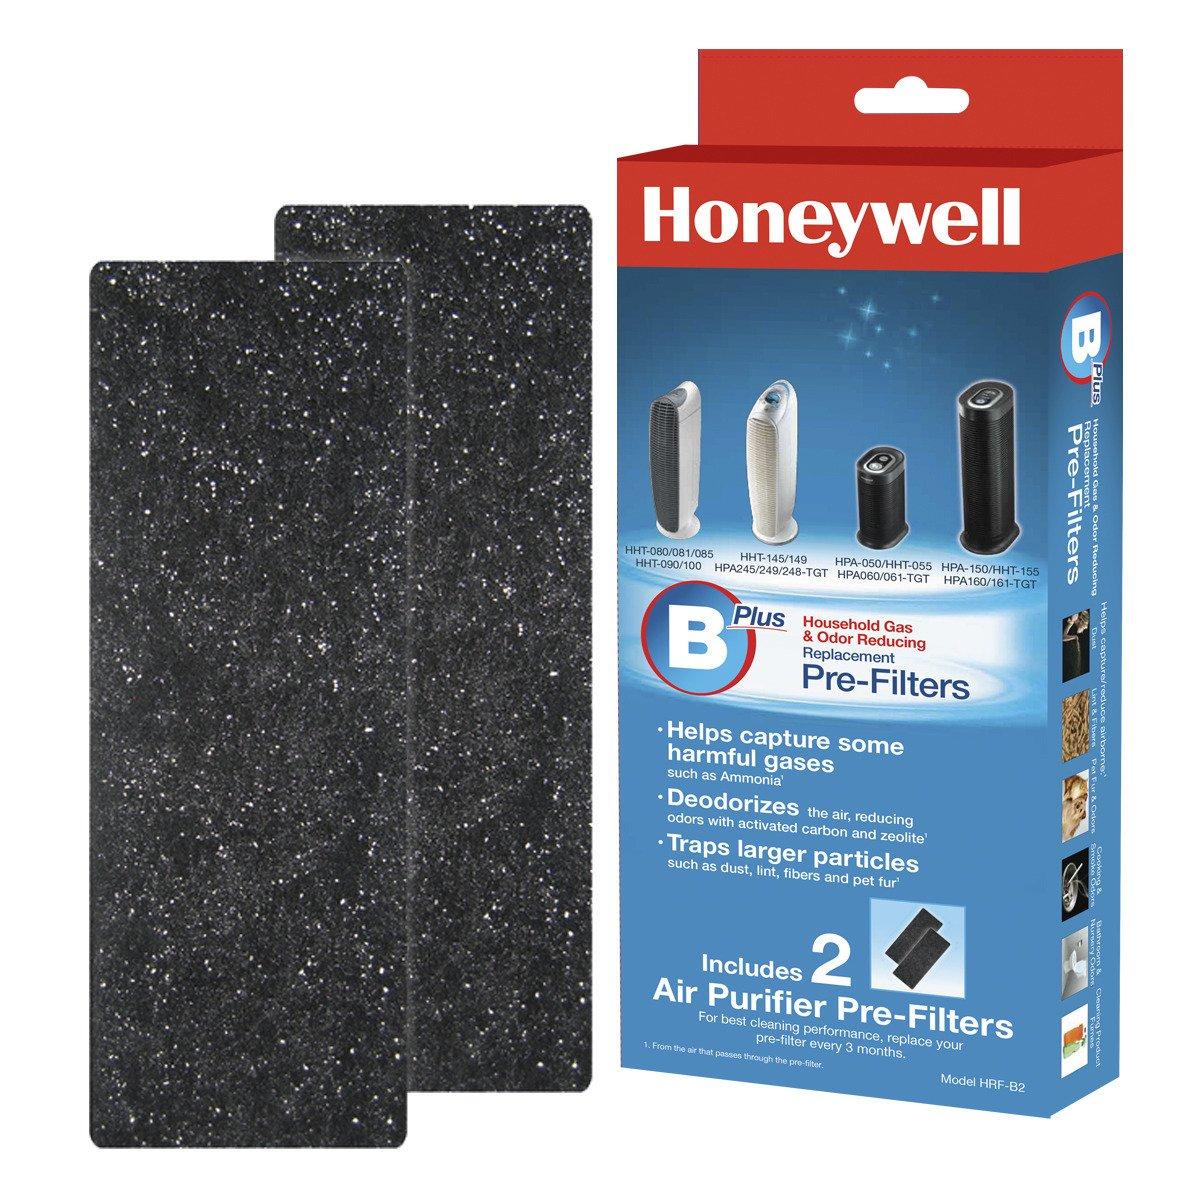 Honeywell HRF-B2C Pre-filter (B Plus) for Air Purifier